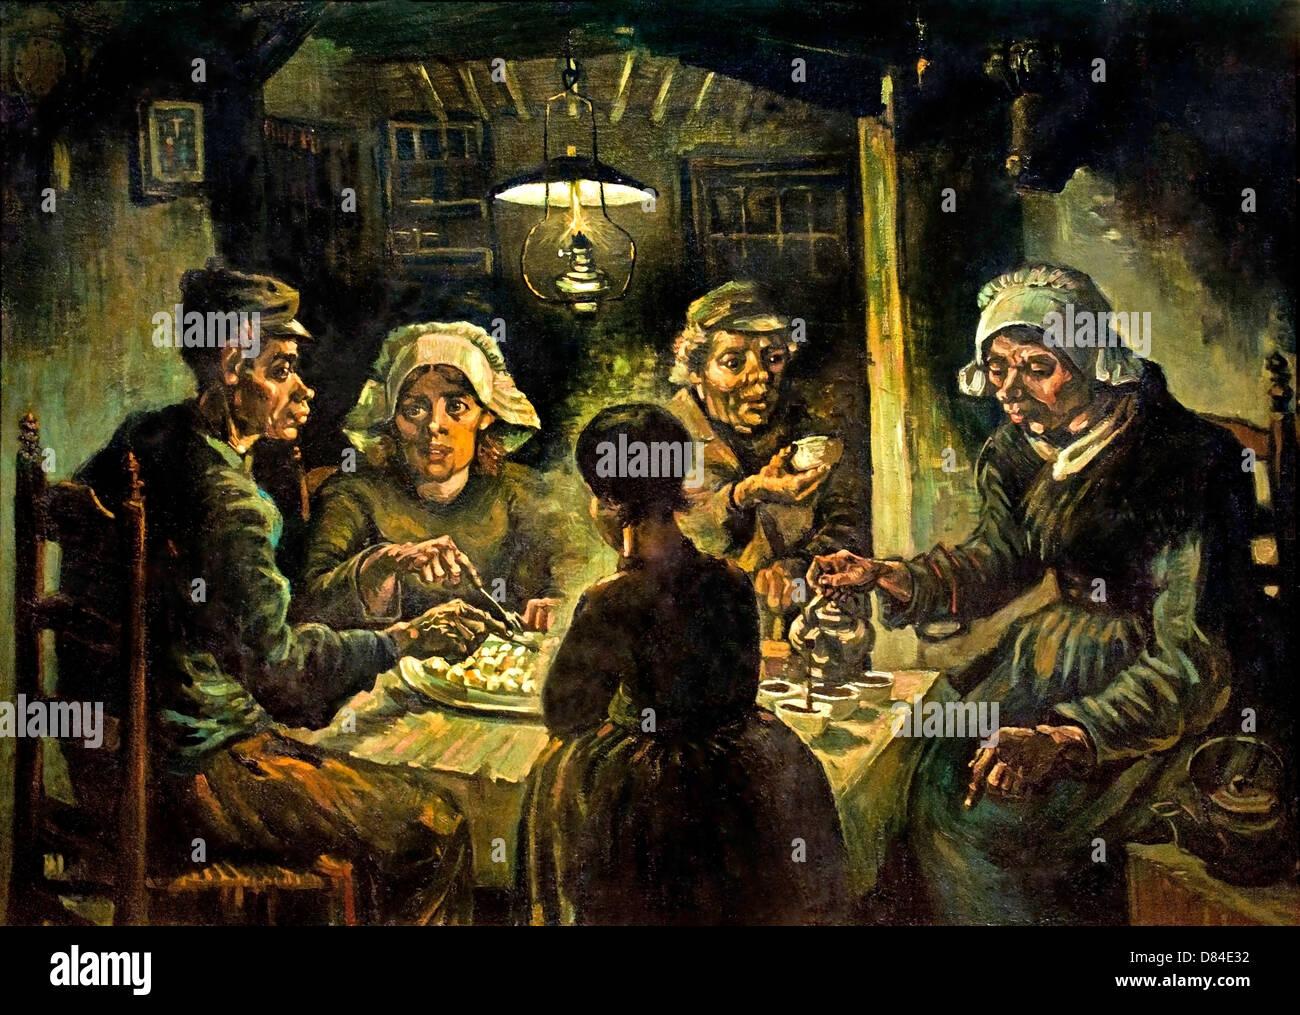 The potato eaters 1885 realism vincent van gogh 1853 1890 dutch stock photo royalty free - Van gogh comedores de patatas ...